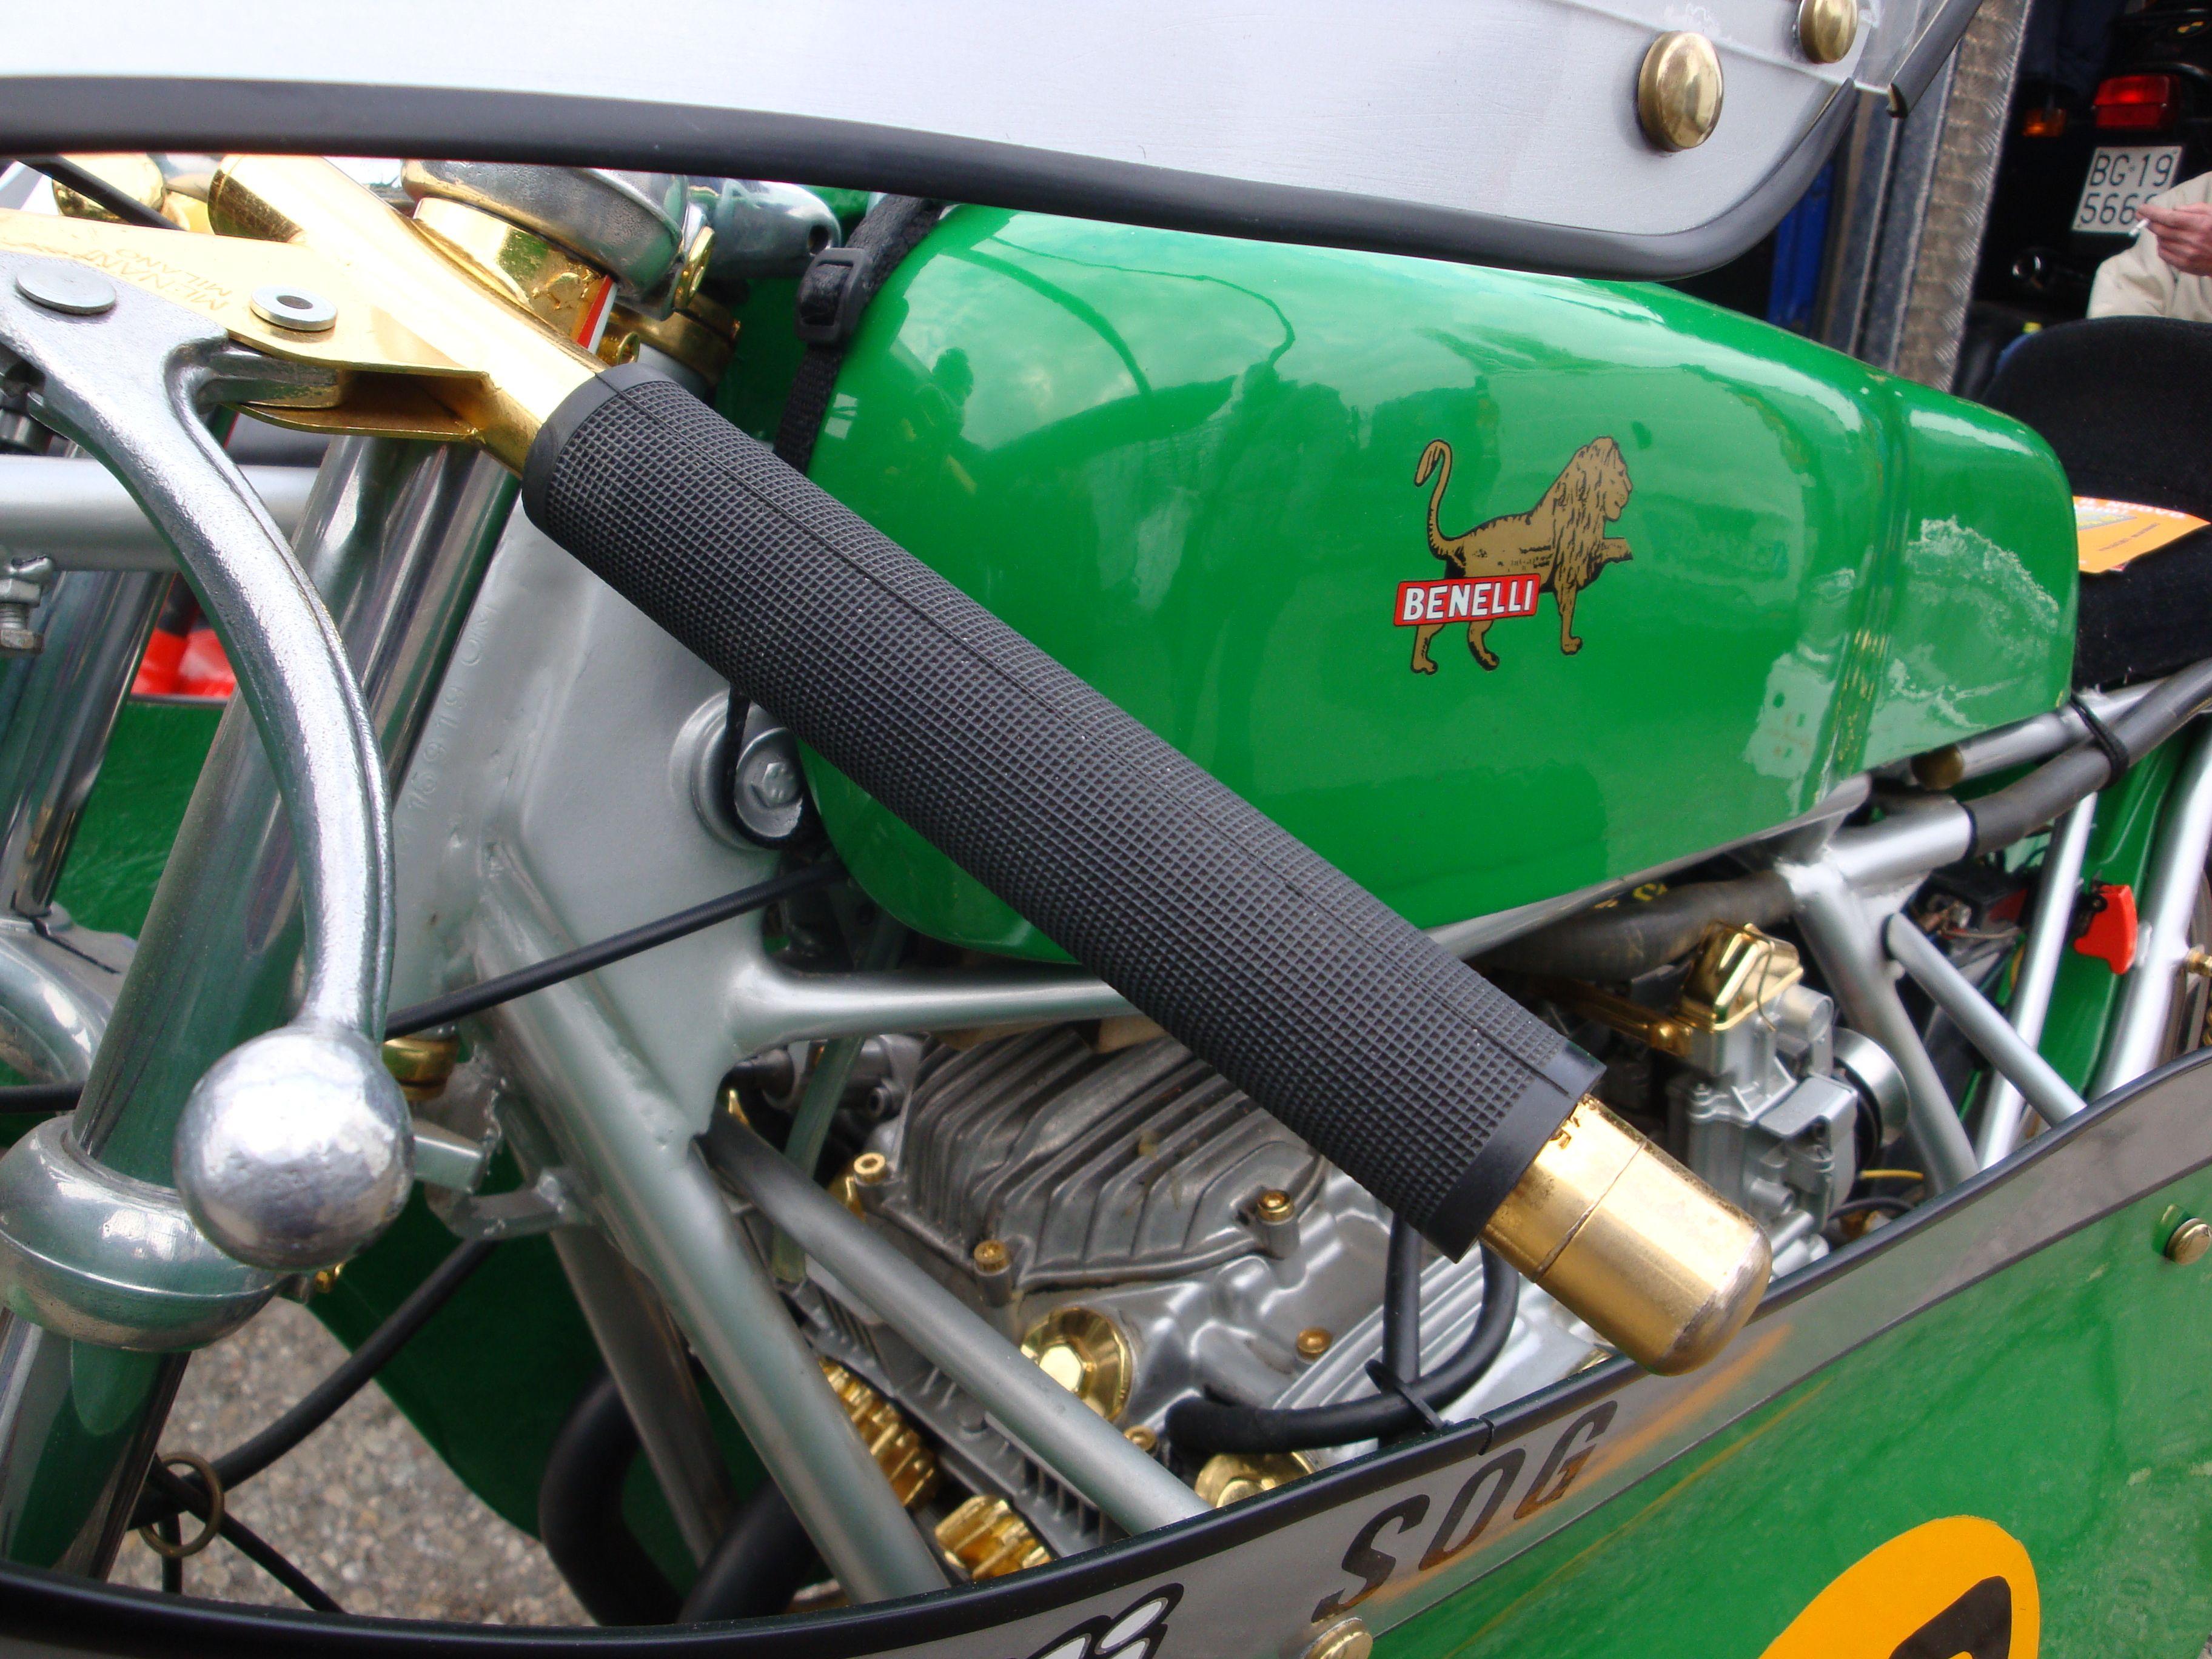 Vintage Benelli Motorcycle 16